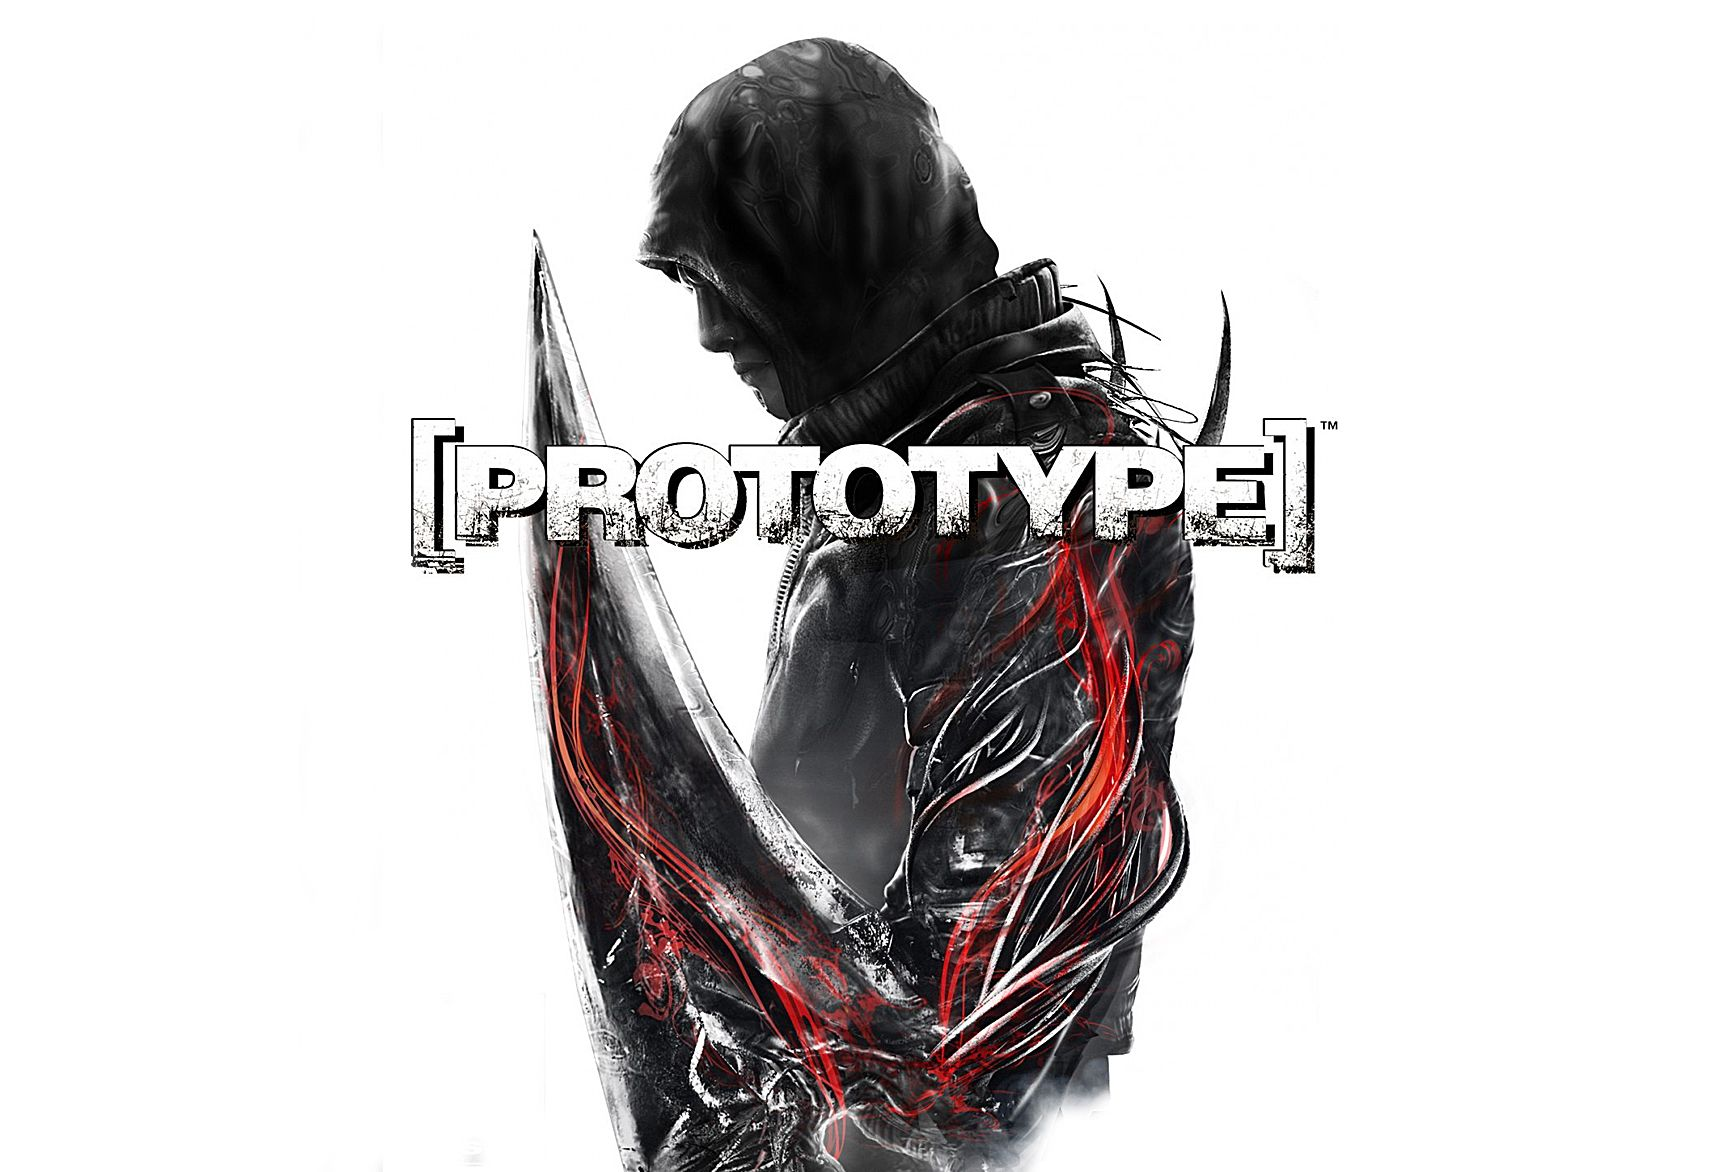 Prototype | Jogos online, Jogos ps3, Mundo dos games